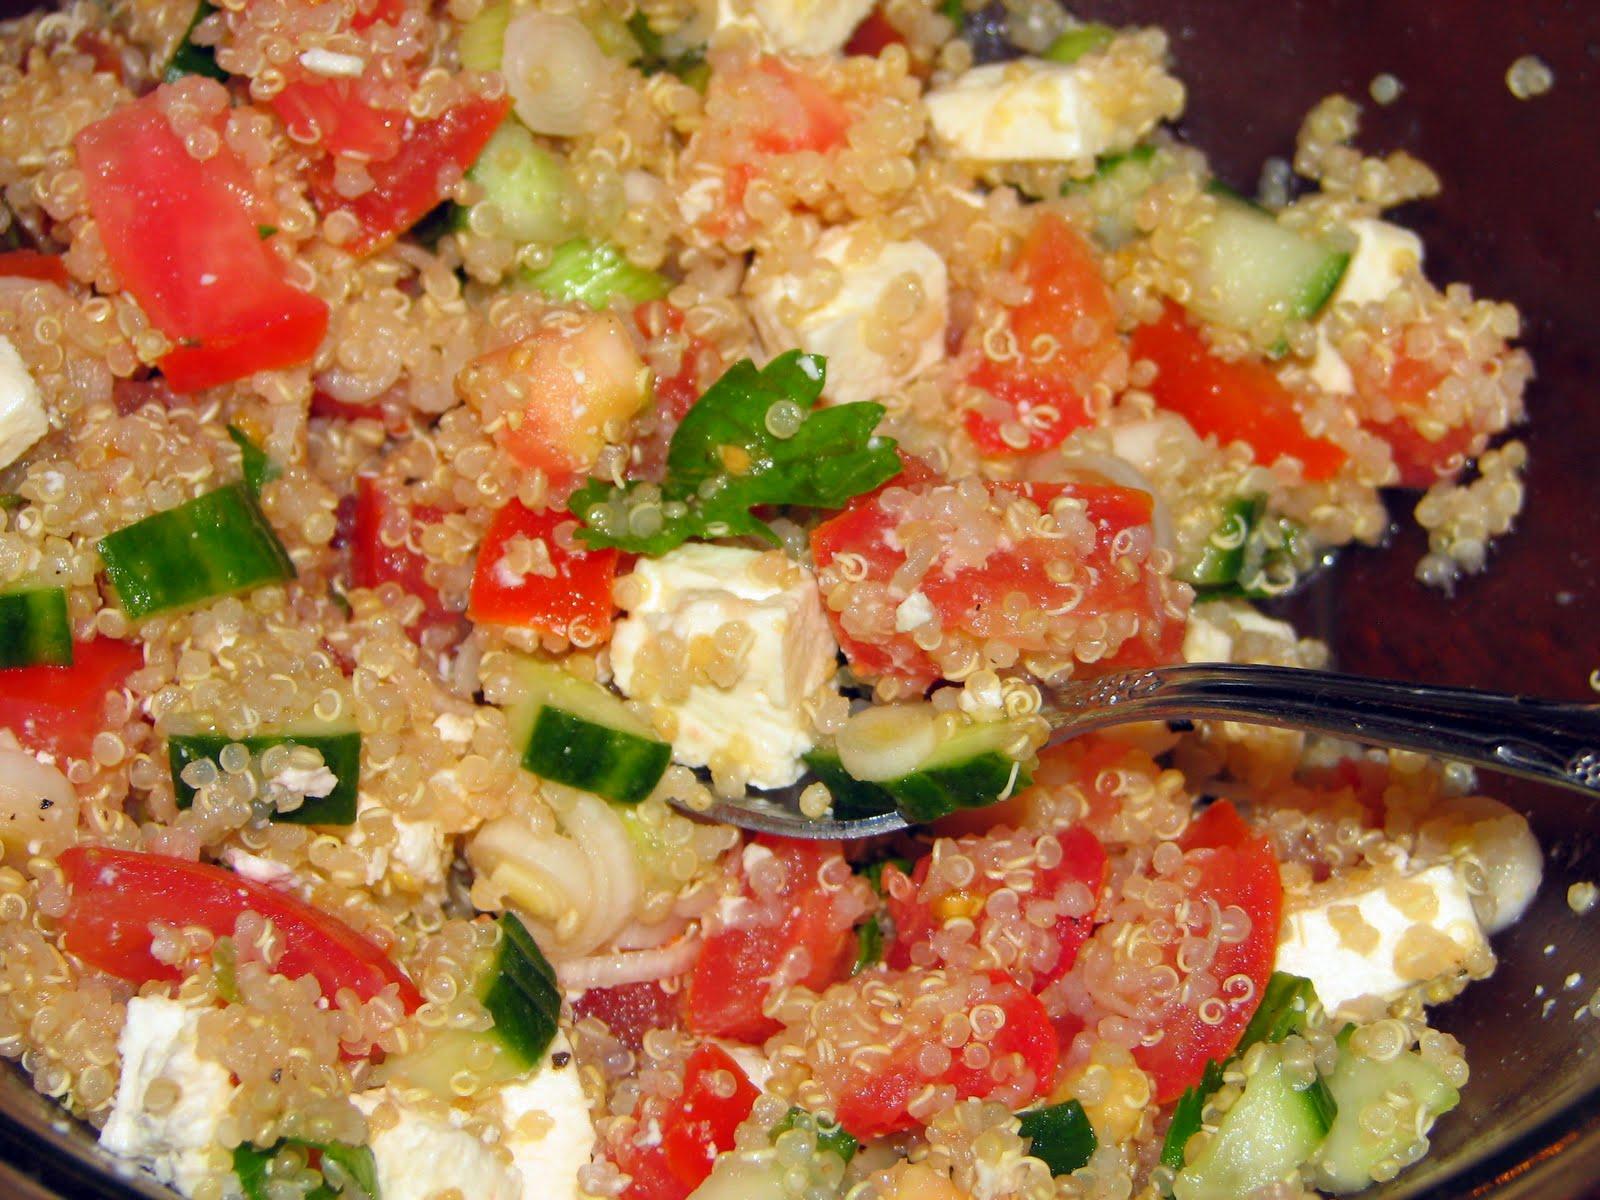 Feeding Four: Summer Quinoa Salad